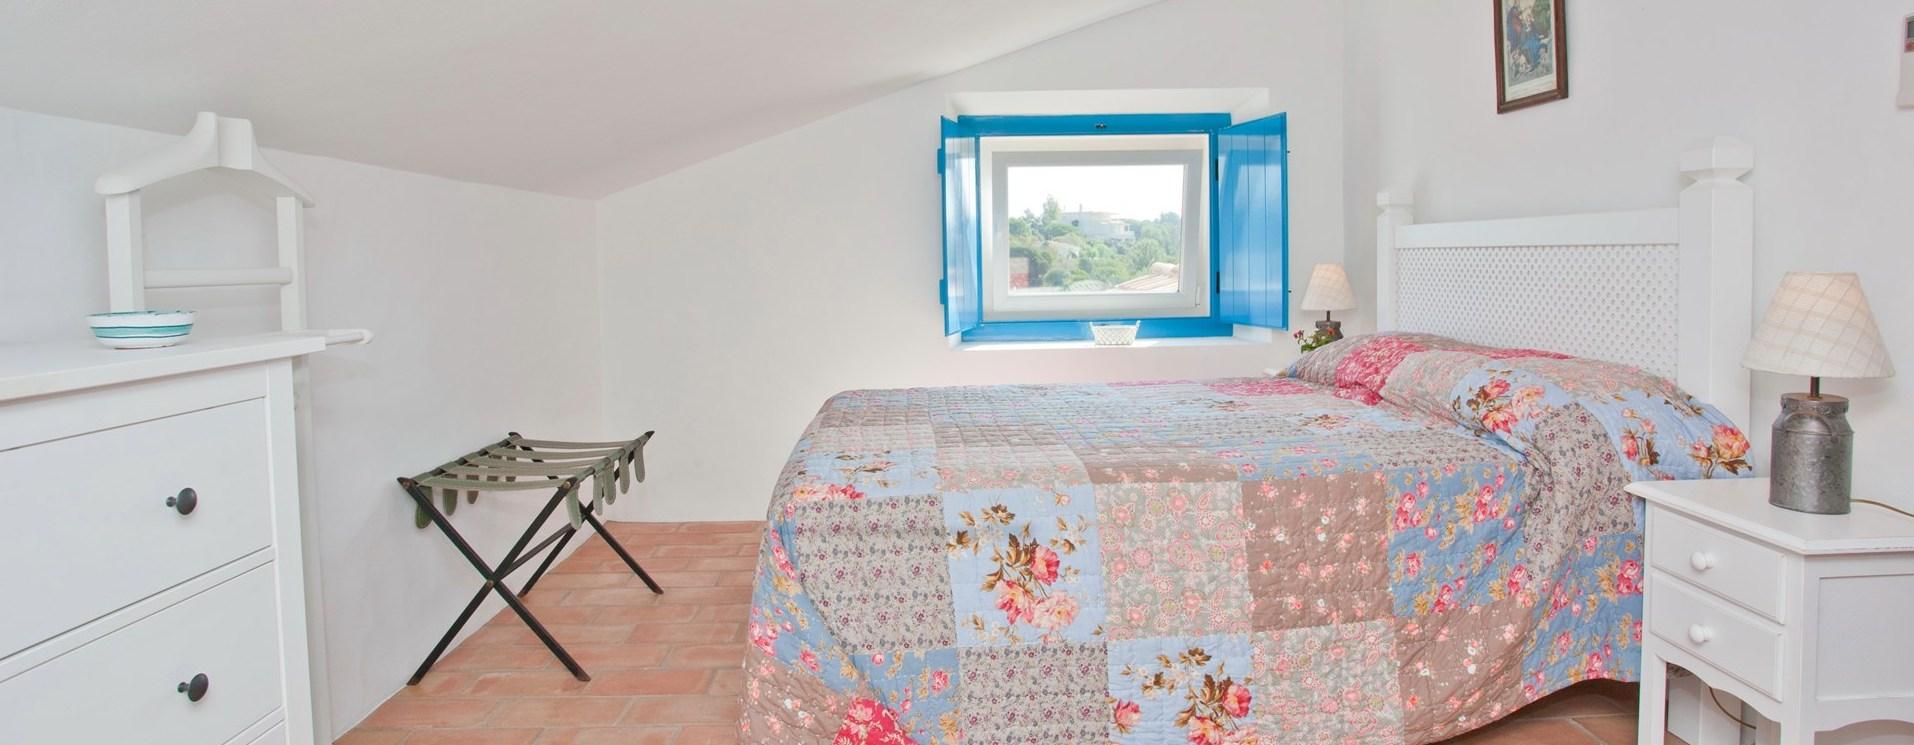 beach-cottage-algarve-bedroom